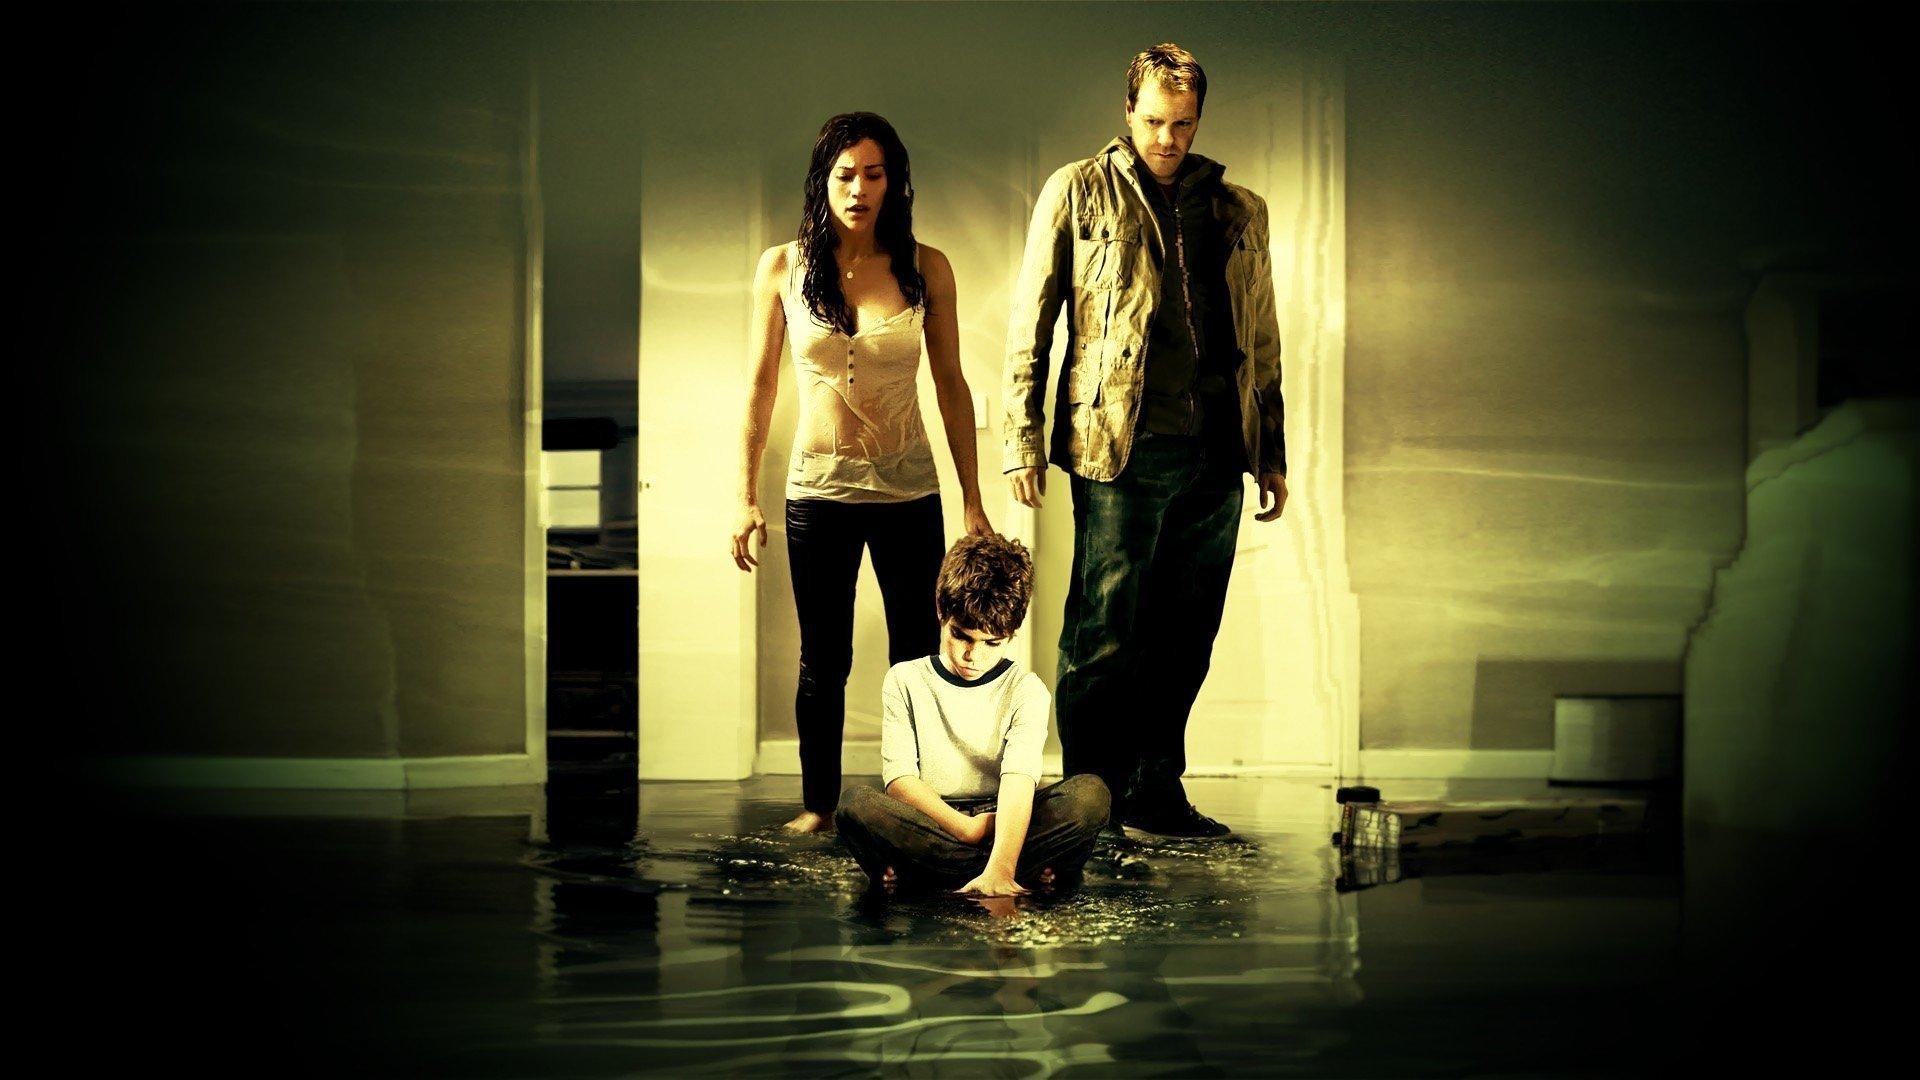 Mirrors bpxxx movie — img 3